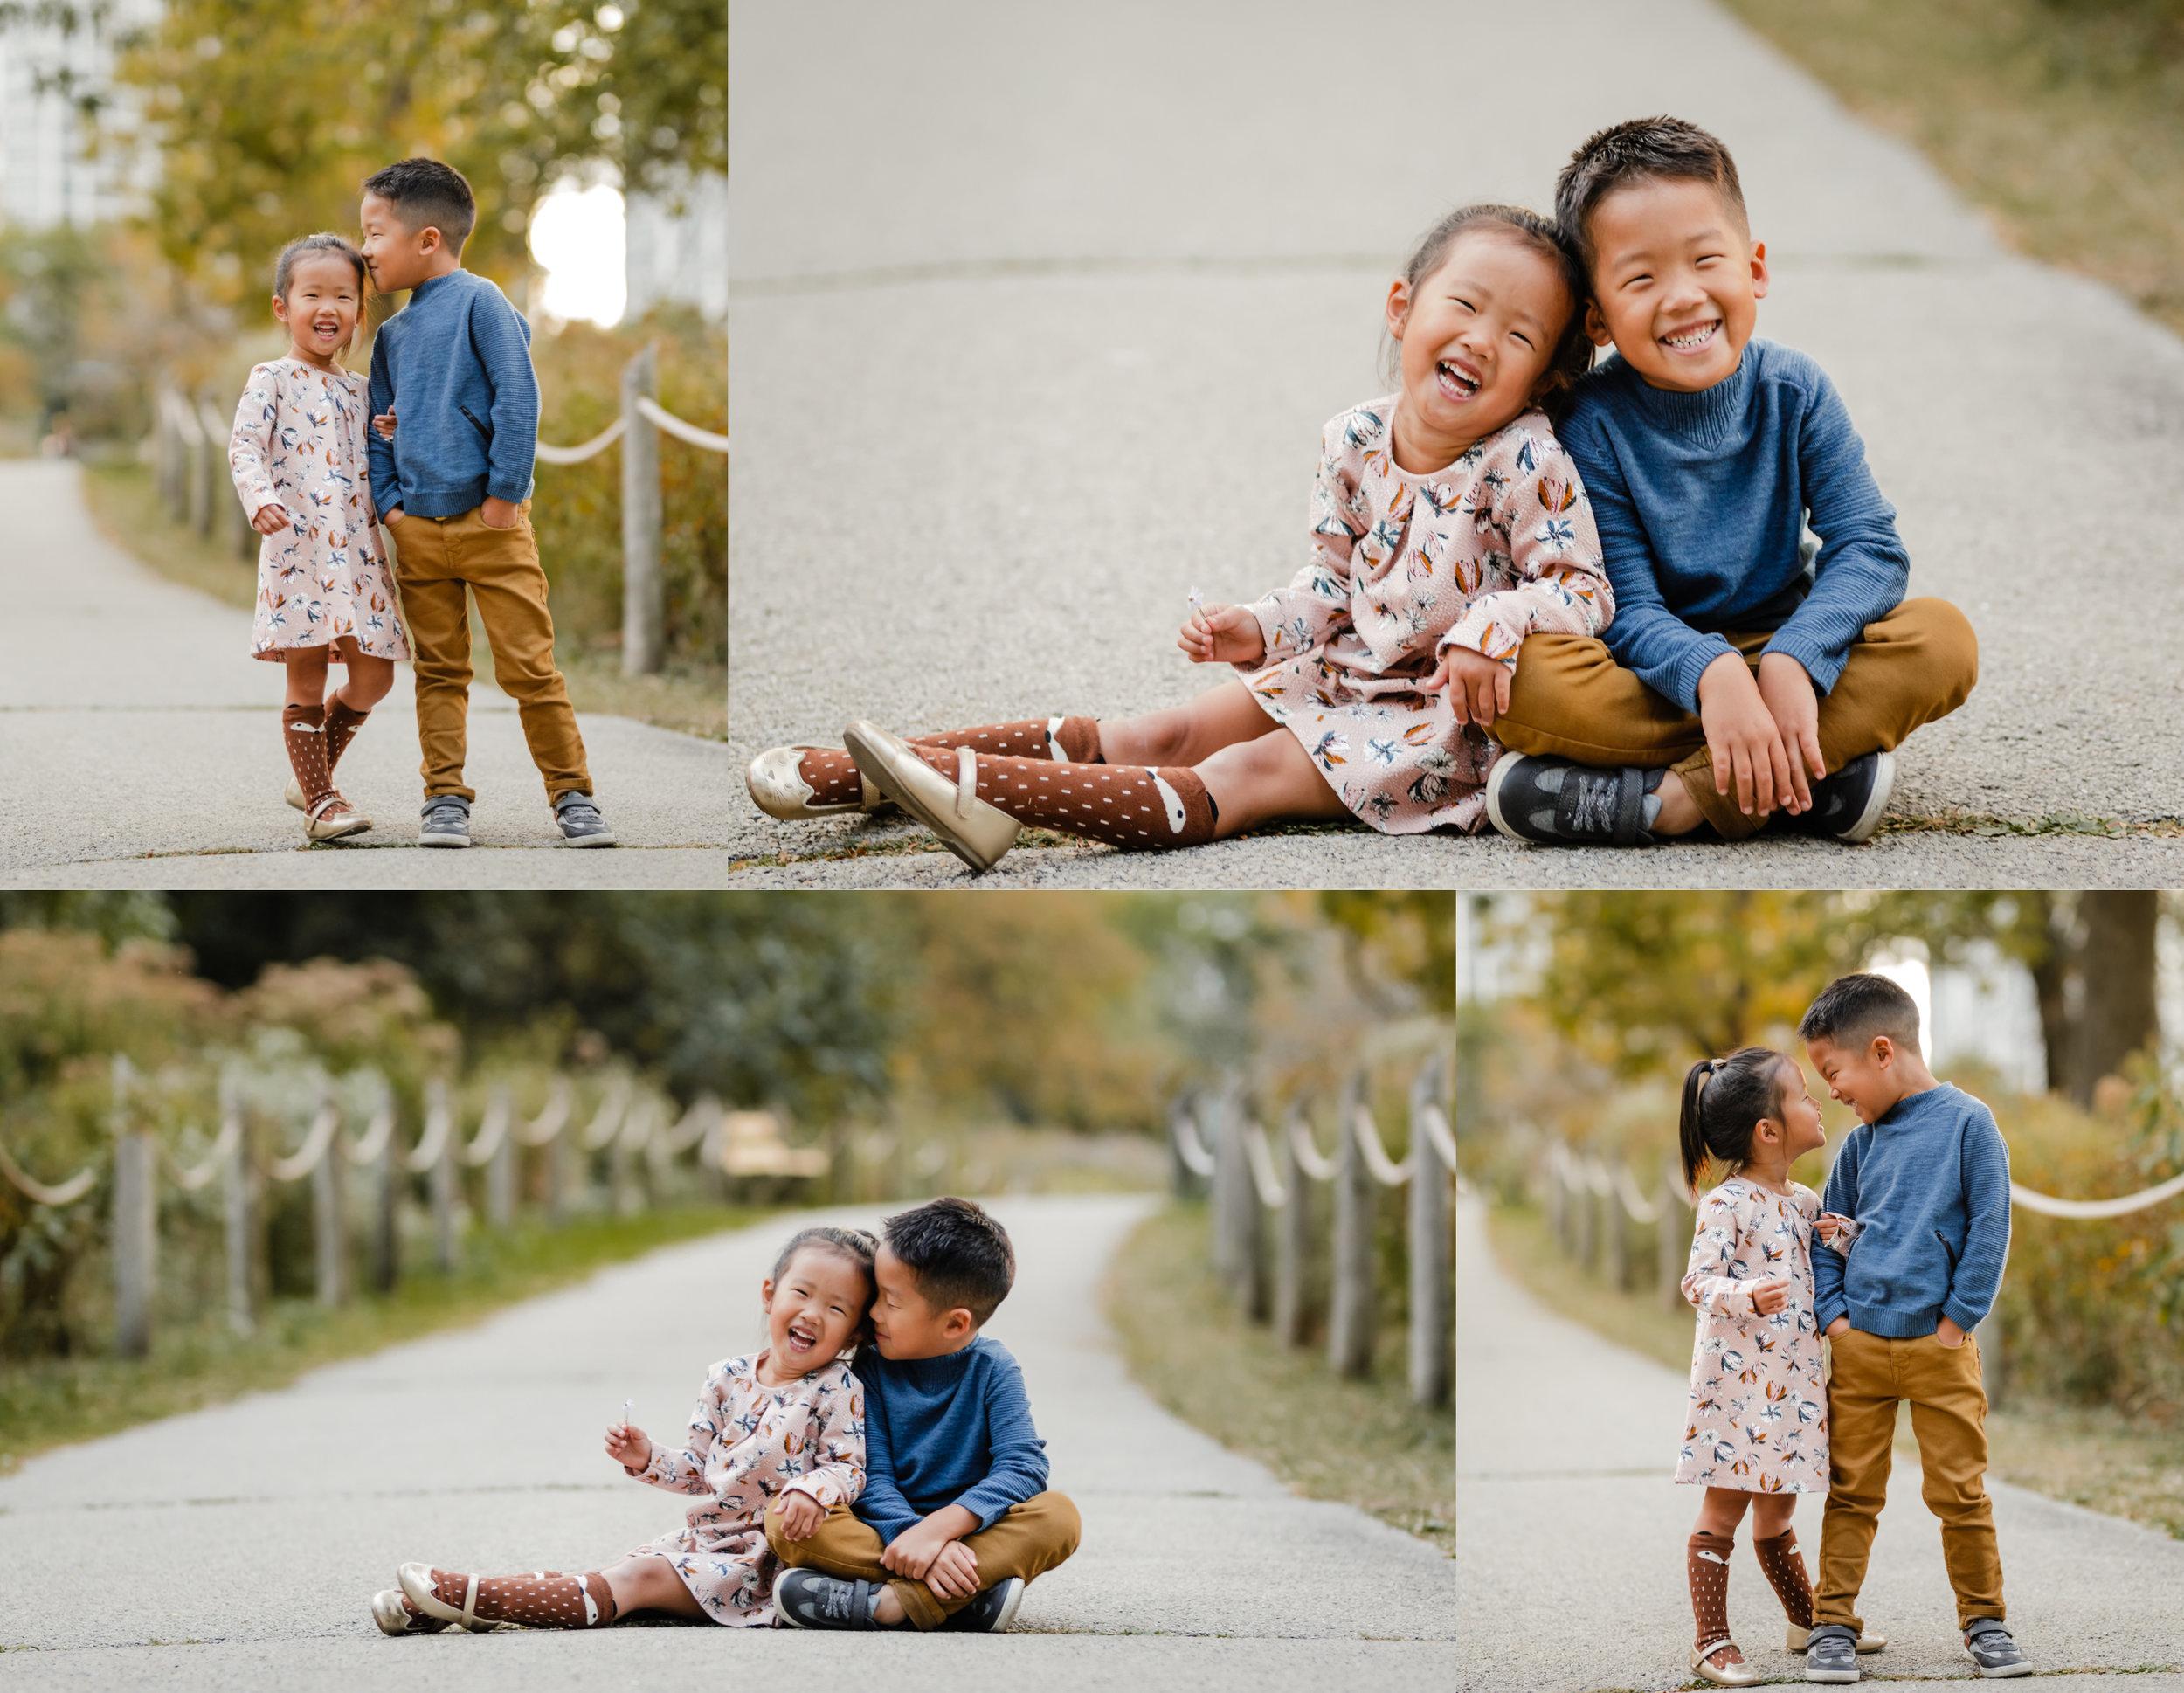 4-CHICAGO FAMILY LIFESTYLE PHOTOGRAPHER JENNY GRIMM PHOTOGRAPHY BLOG.jpg